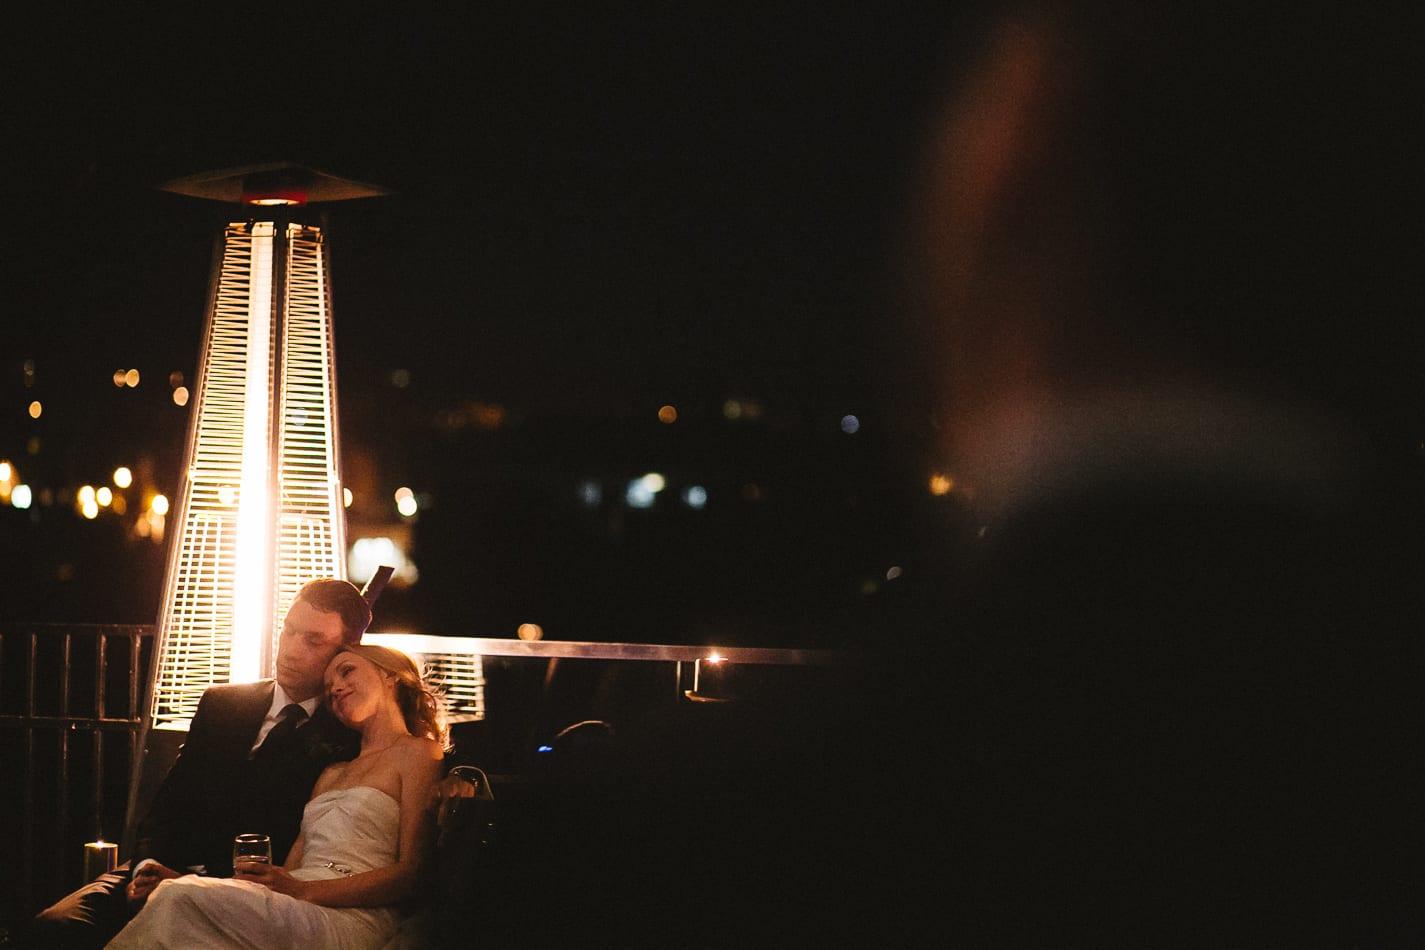 lake-redding-park-diesel-horse-bridge-view202-california-wedding-photographer-29